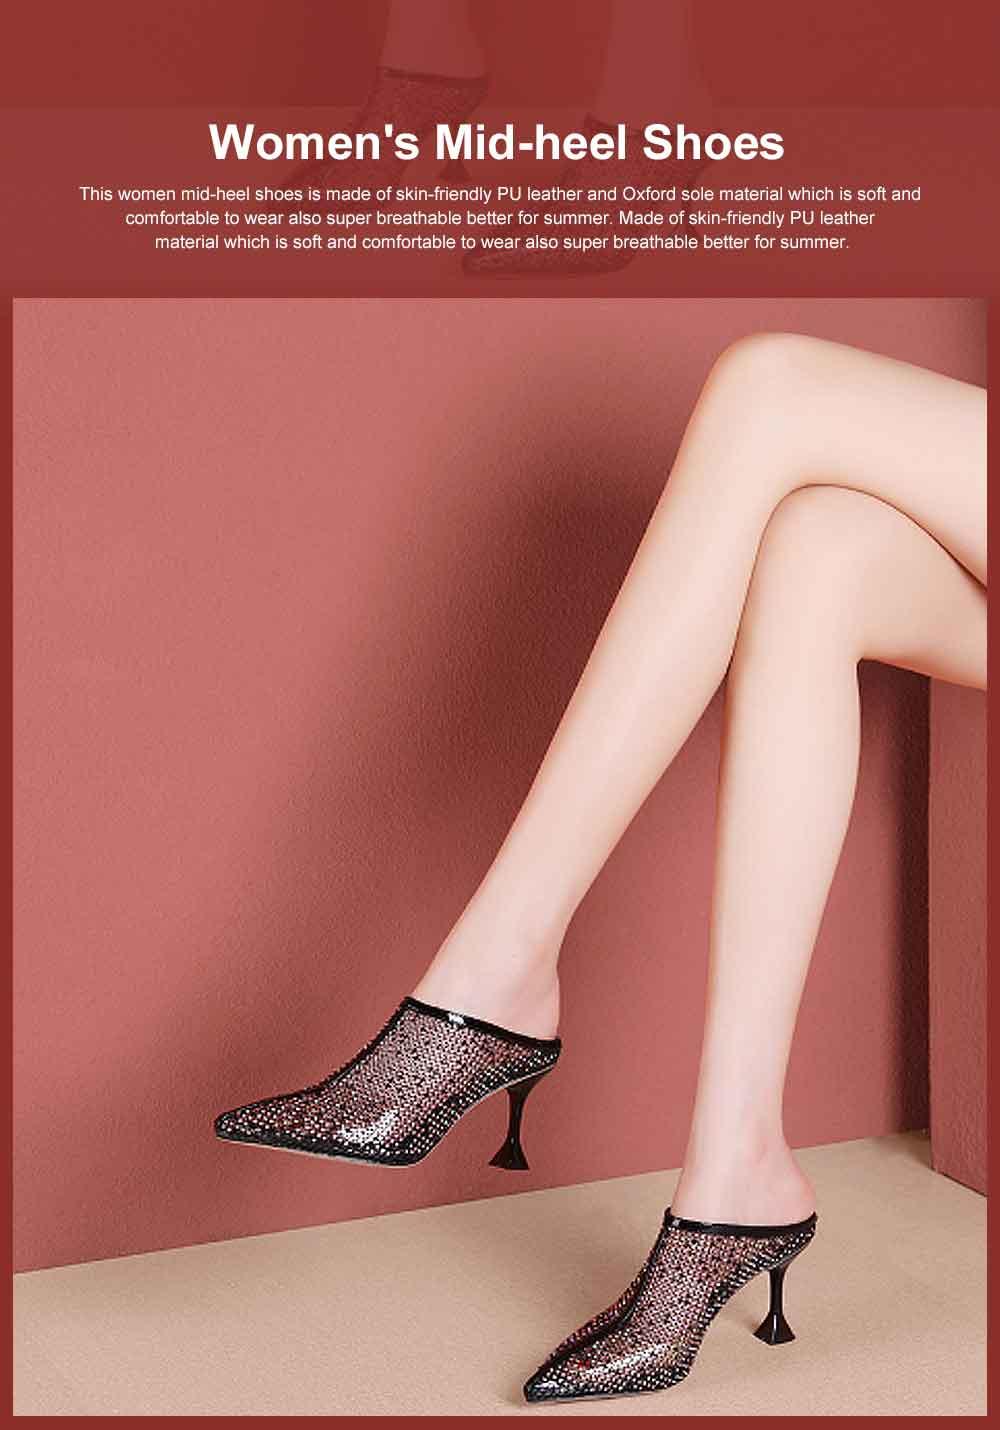 Women's Mid-heel Shoes, Comfortable Pointed Toe Casual Shoe, Fashion Mesh Slim Heel Stiletto Heels Shoes 0